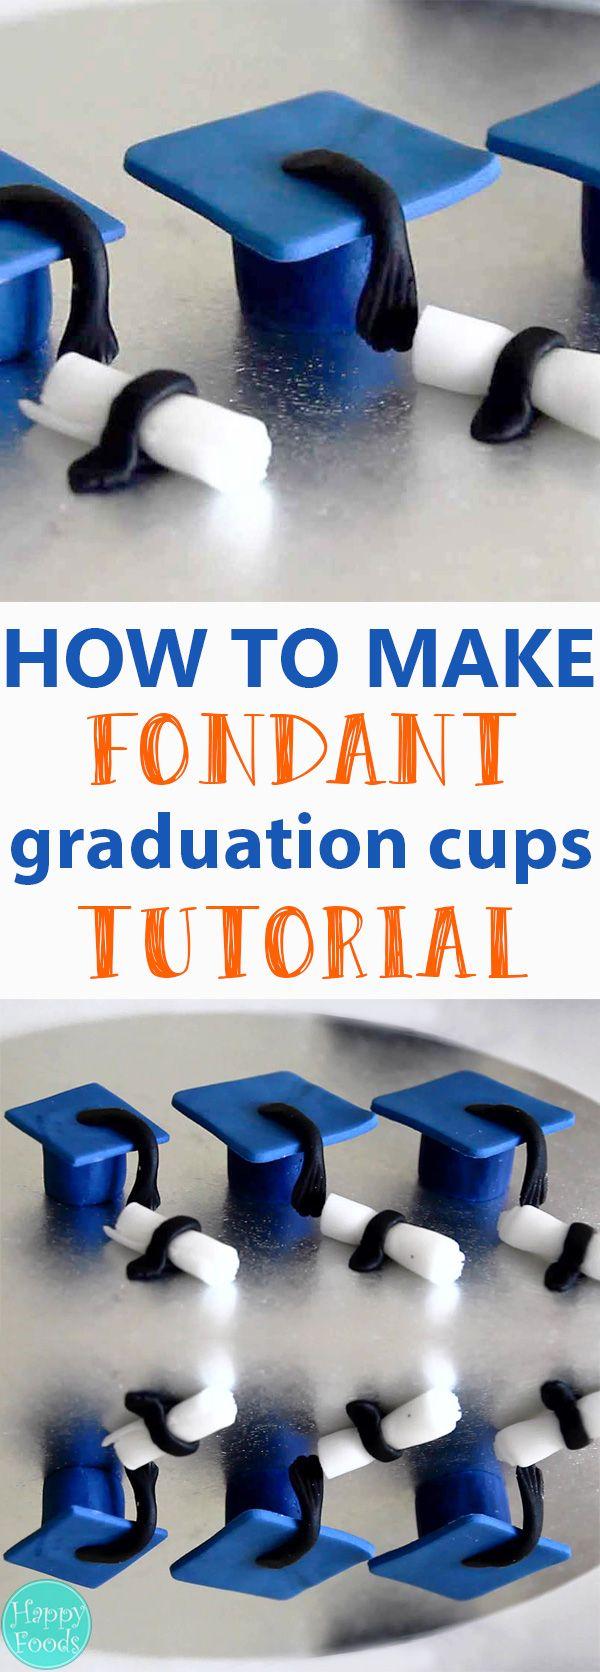 Sugar Paste Cake Decorating How To Make Sugar Paste Fondant Graduation Caps Diplomas Cake